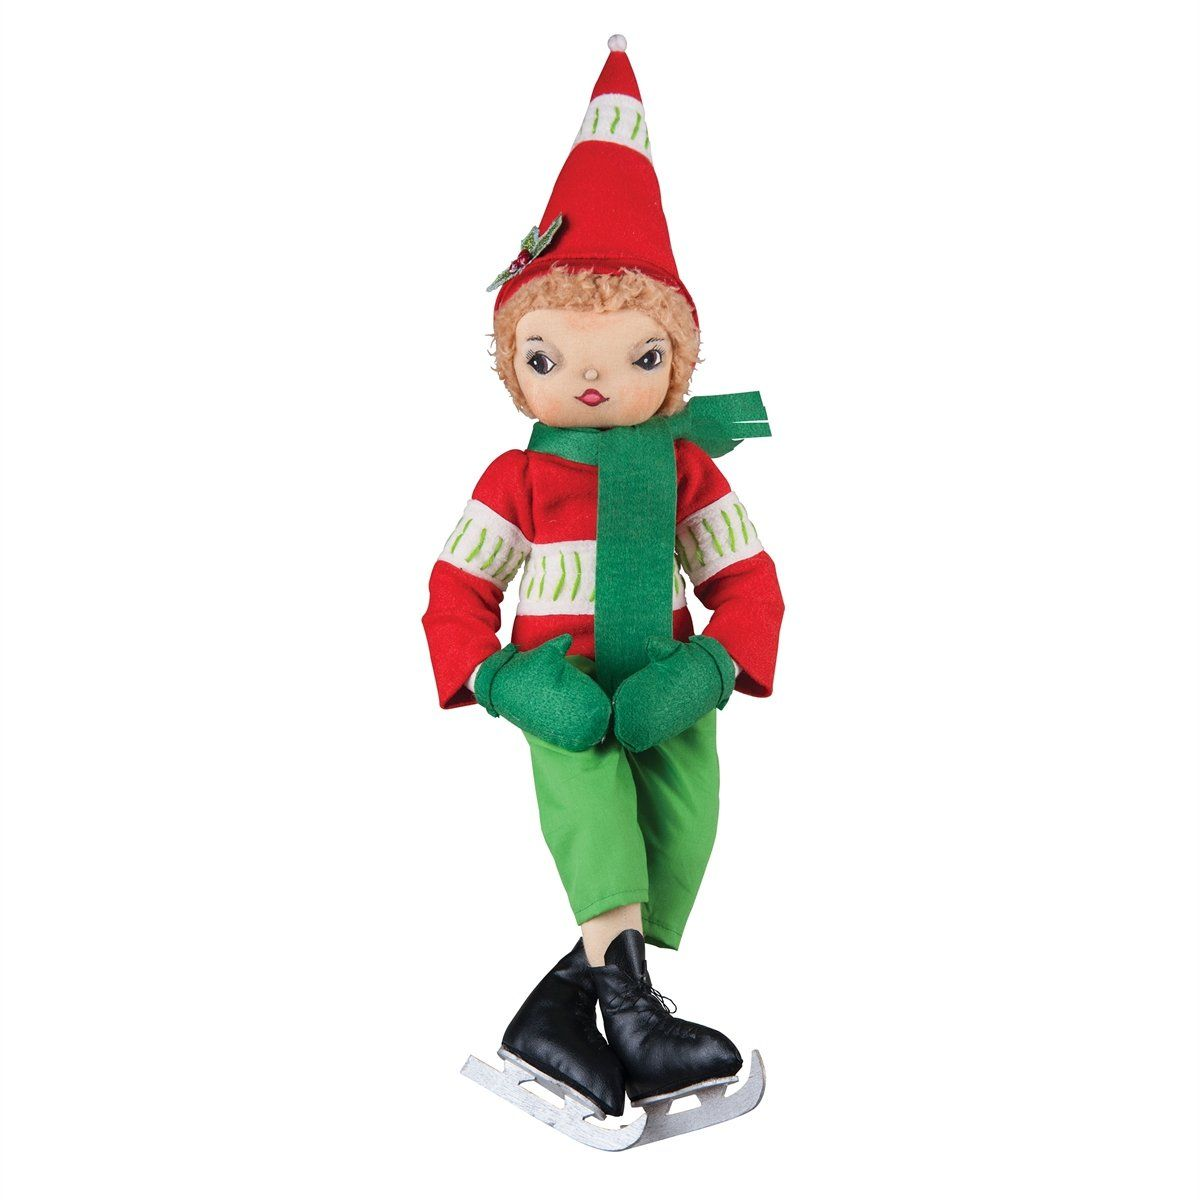 Torrence Ice Skating Christmas Boy | Elves, Christmas colors and ...